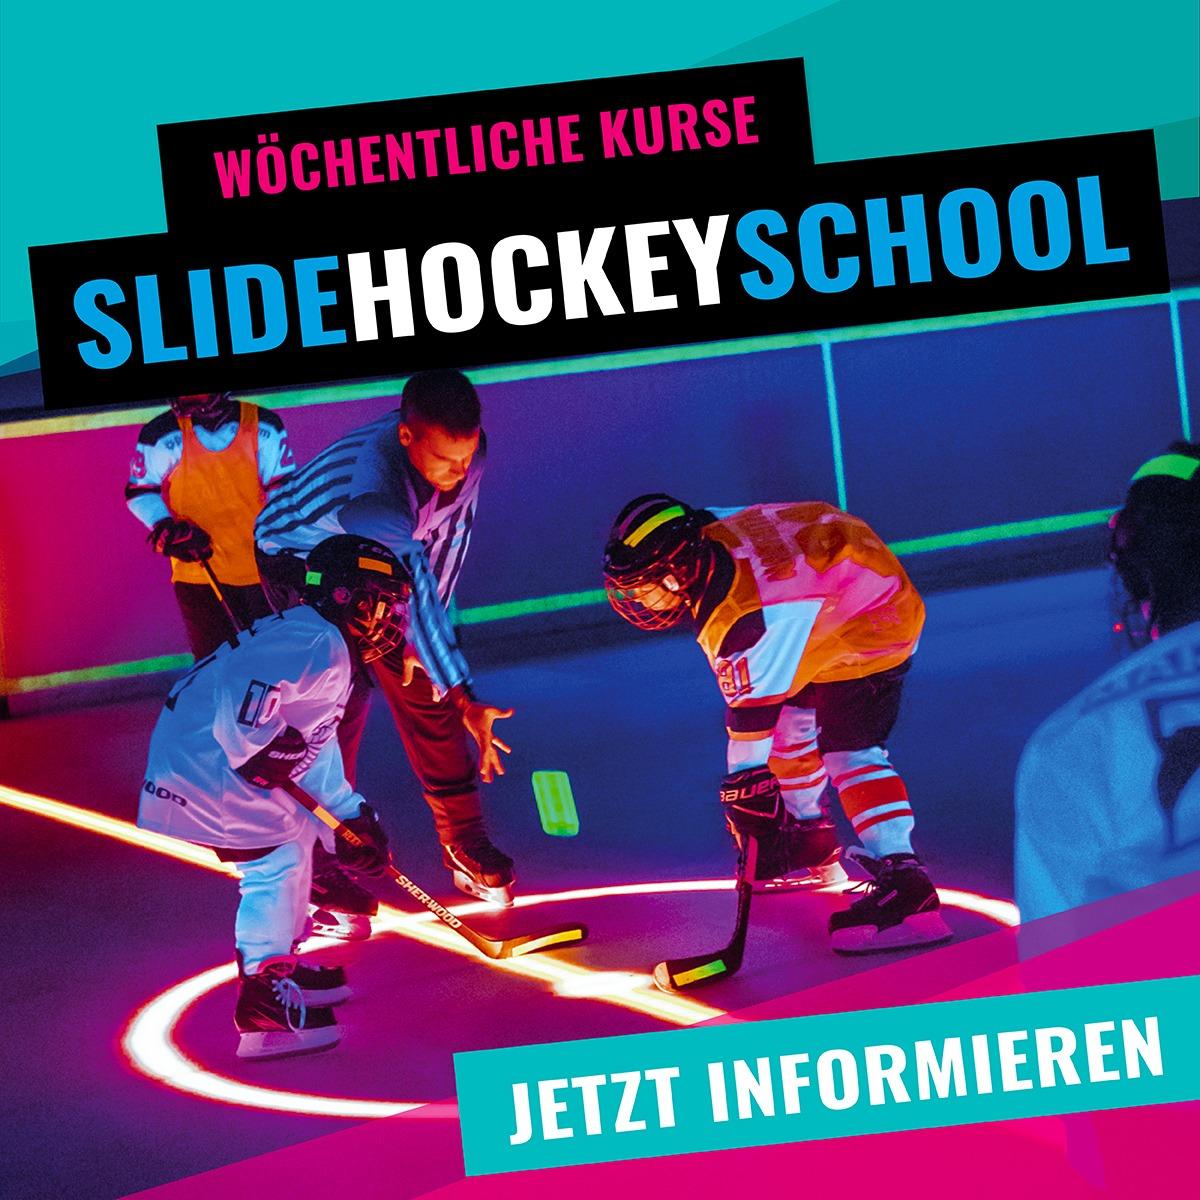 SLIDE COLOGNE Angebotsteaser Hockeyschule und Skate Lauflernschule